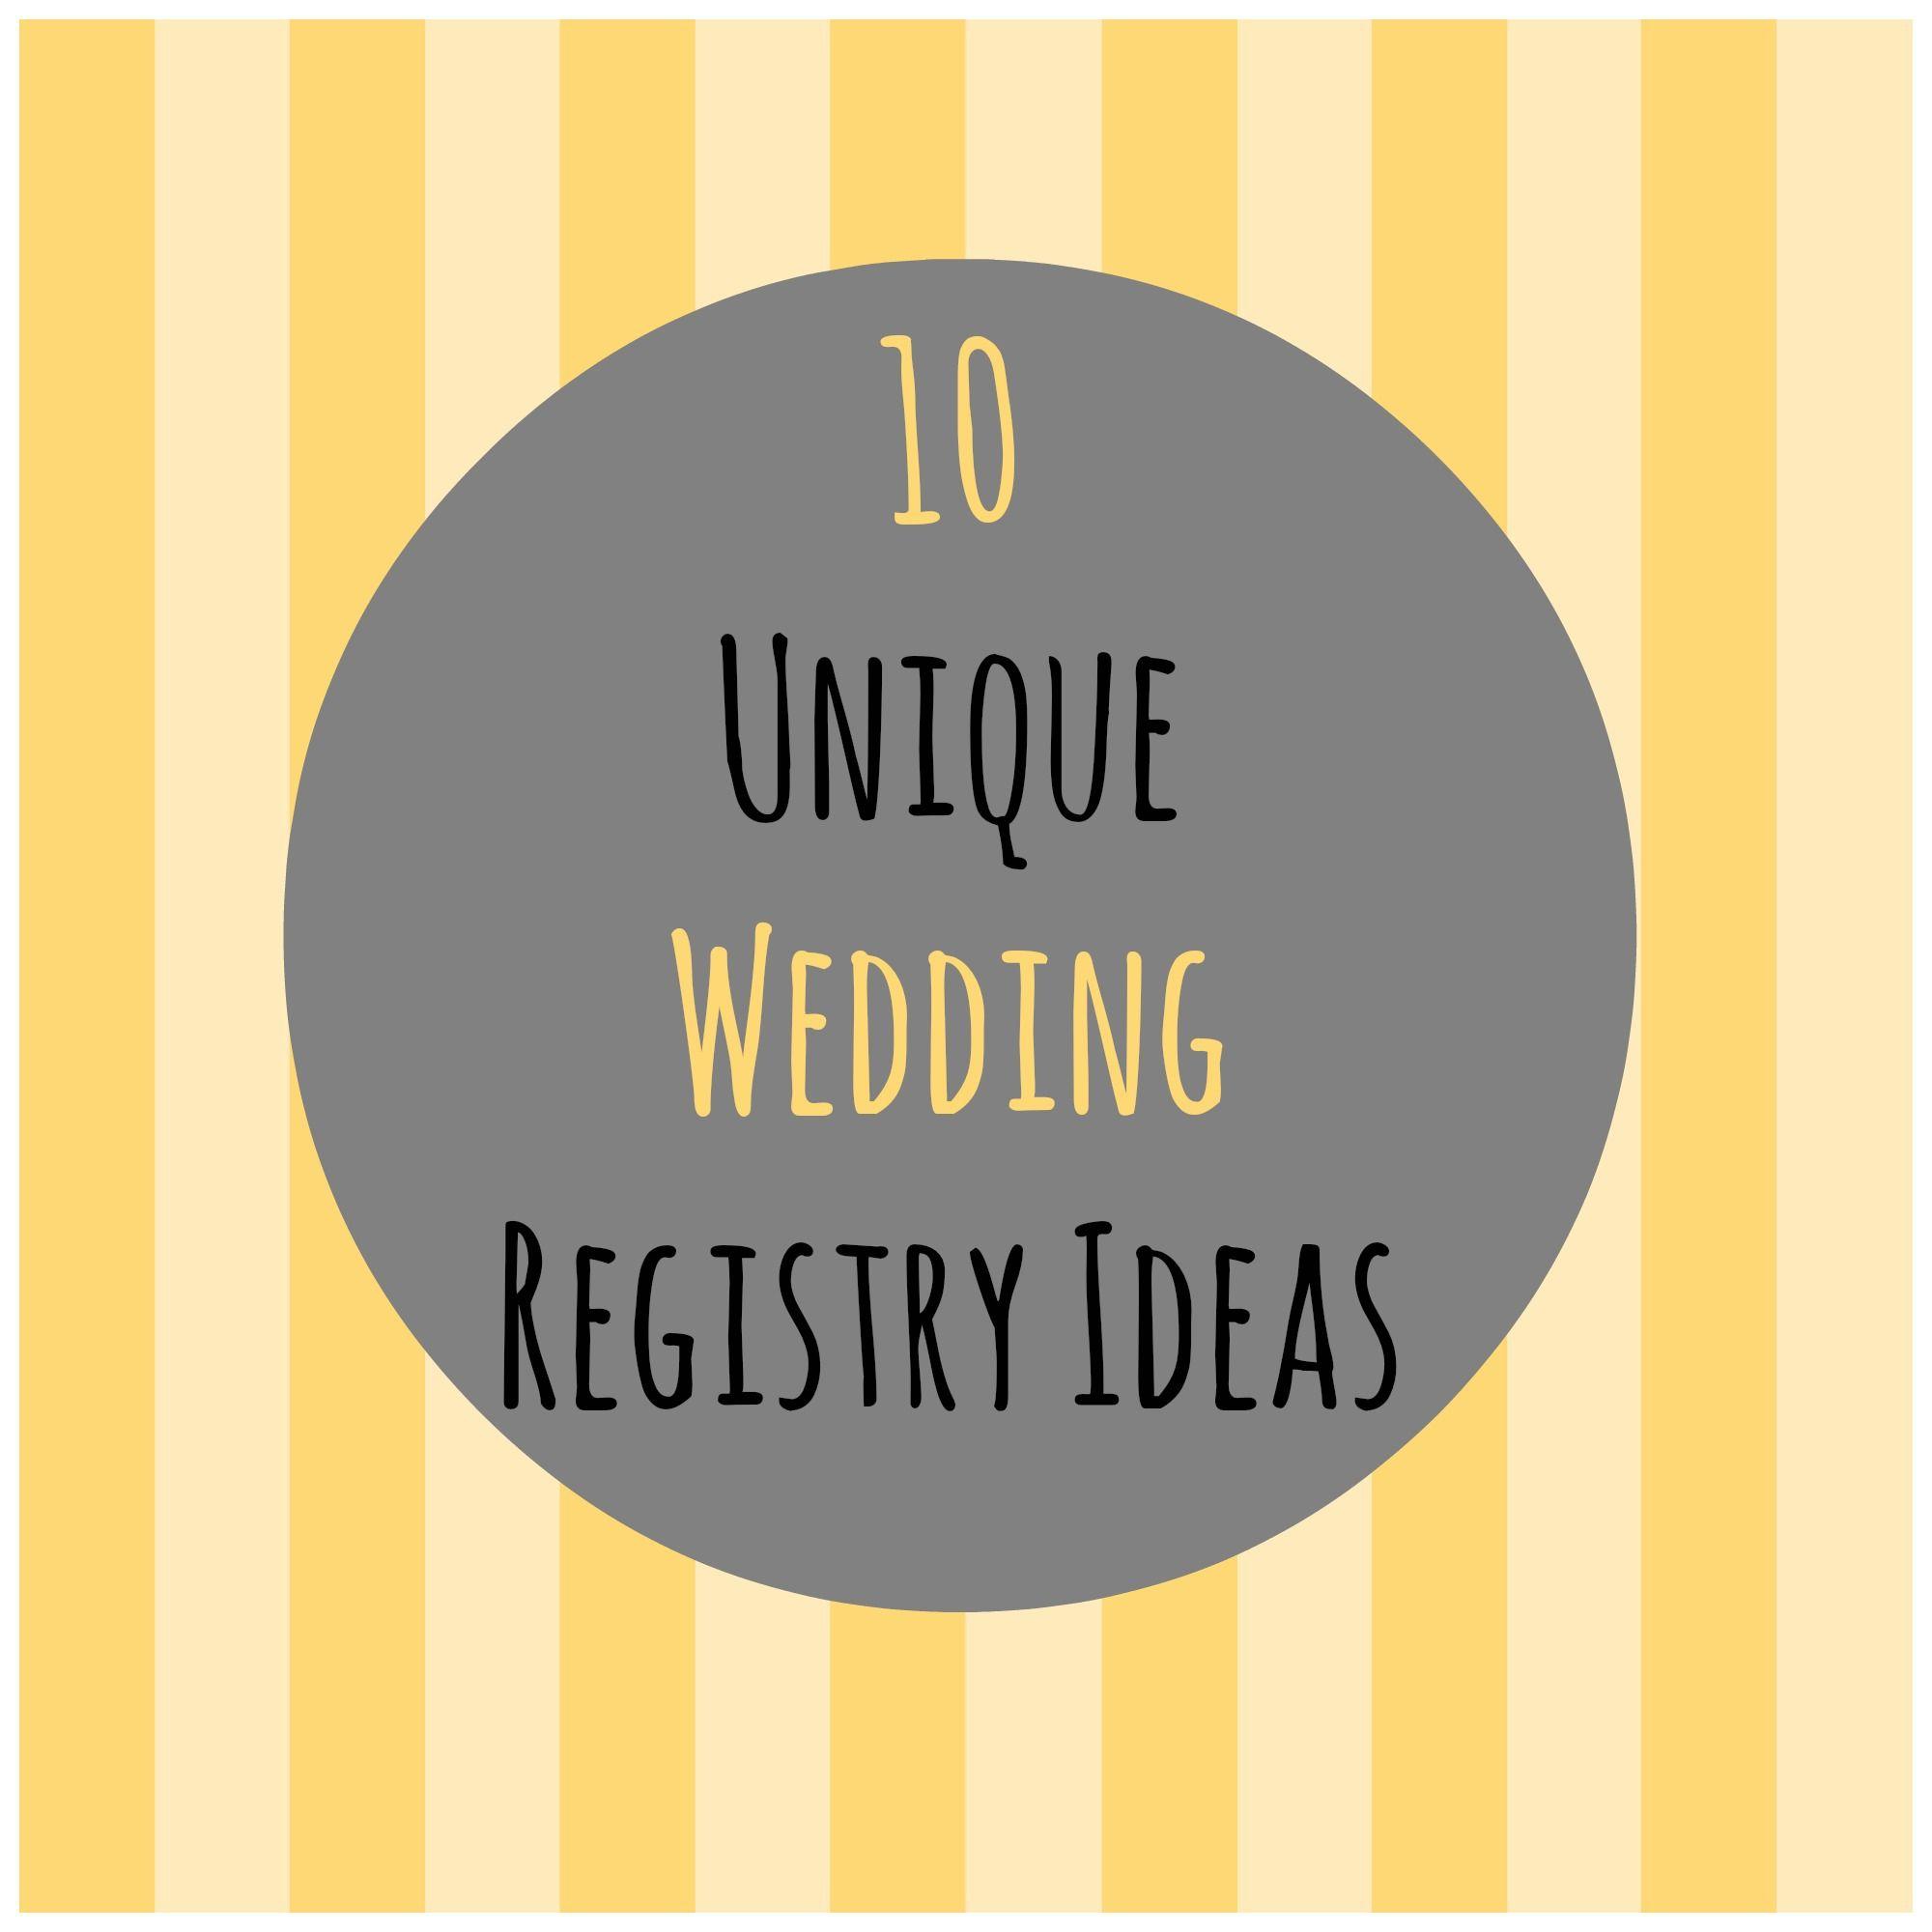 8 Unique Charlottesville Wedding Venues: 8 Unique Wedding Registry Ideas